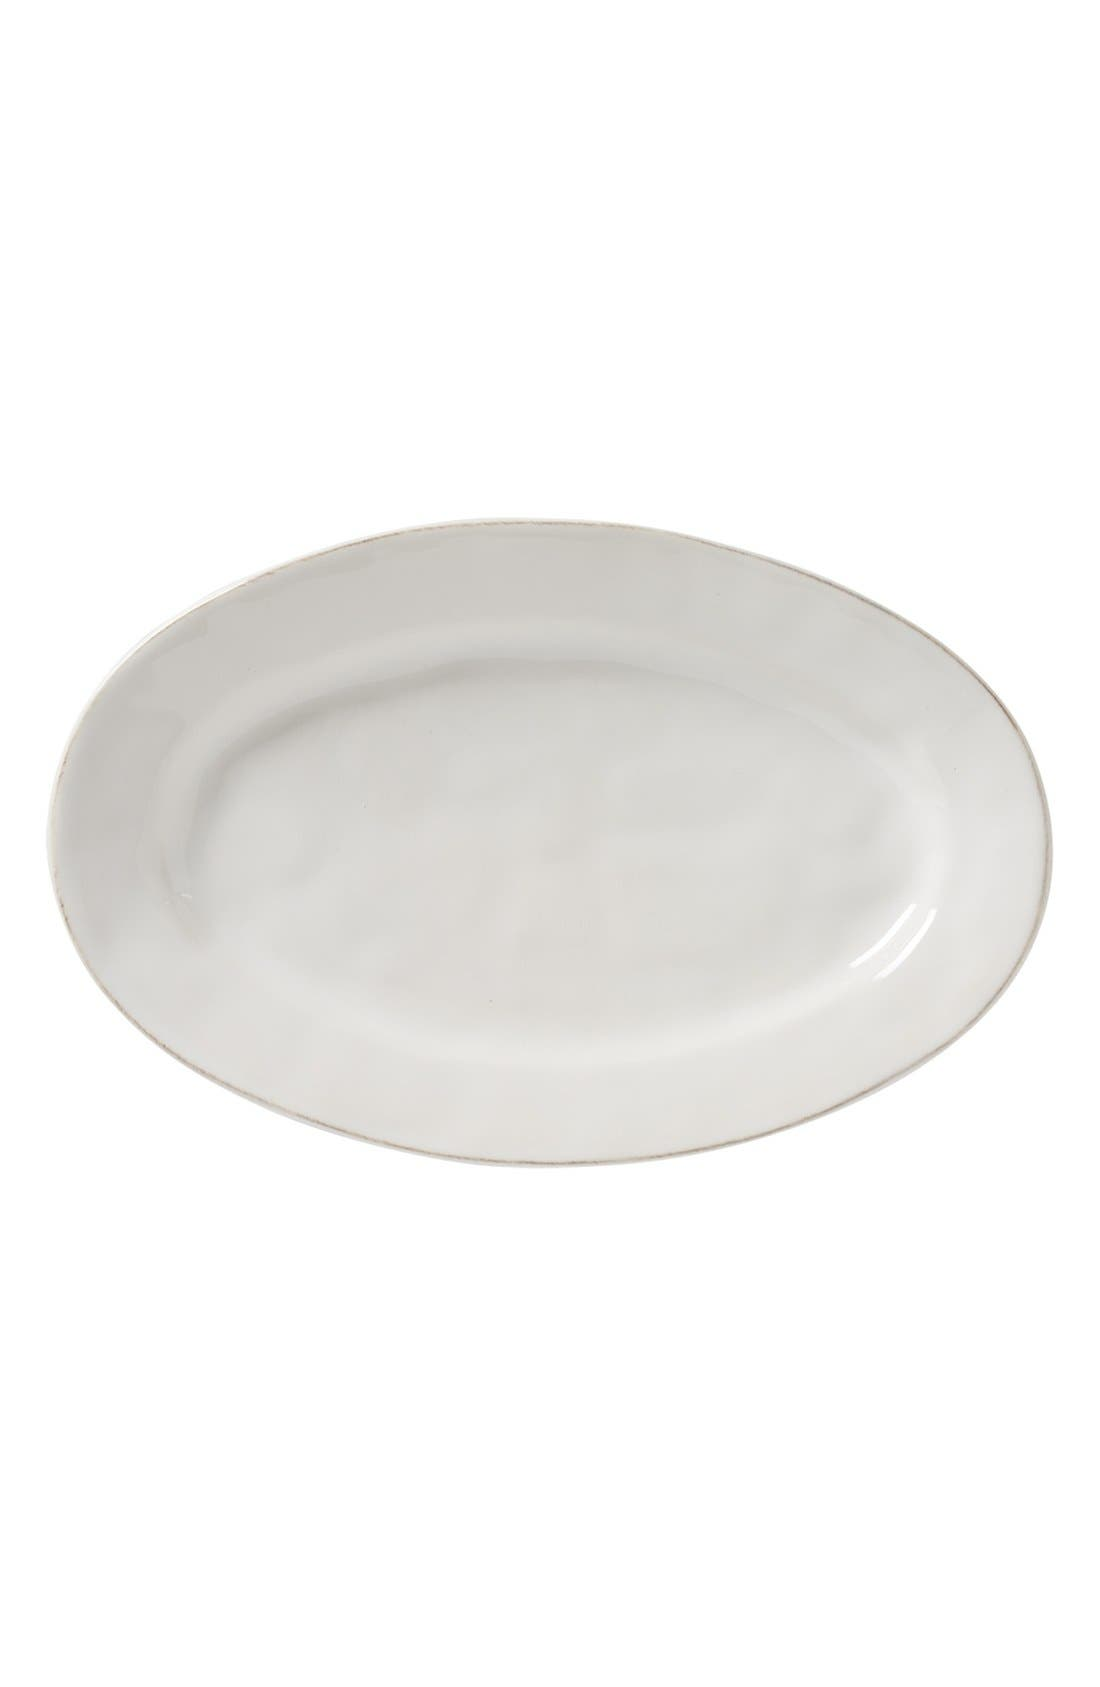 Alternate Image 1 Selected - Juliska 'Puro' Oval Platter